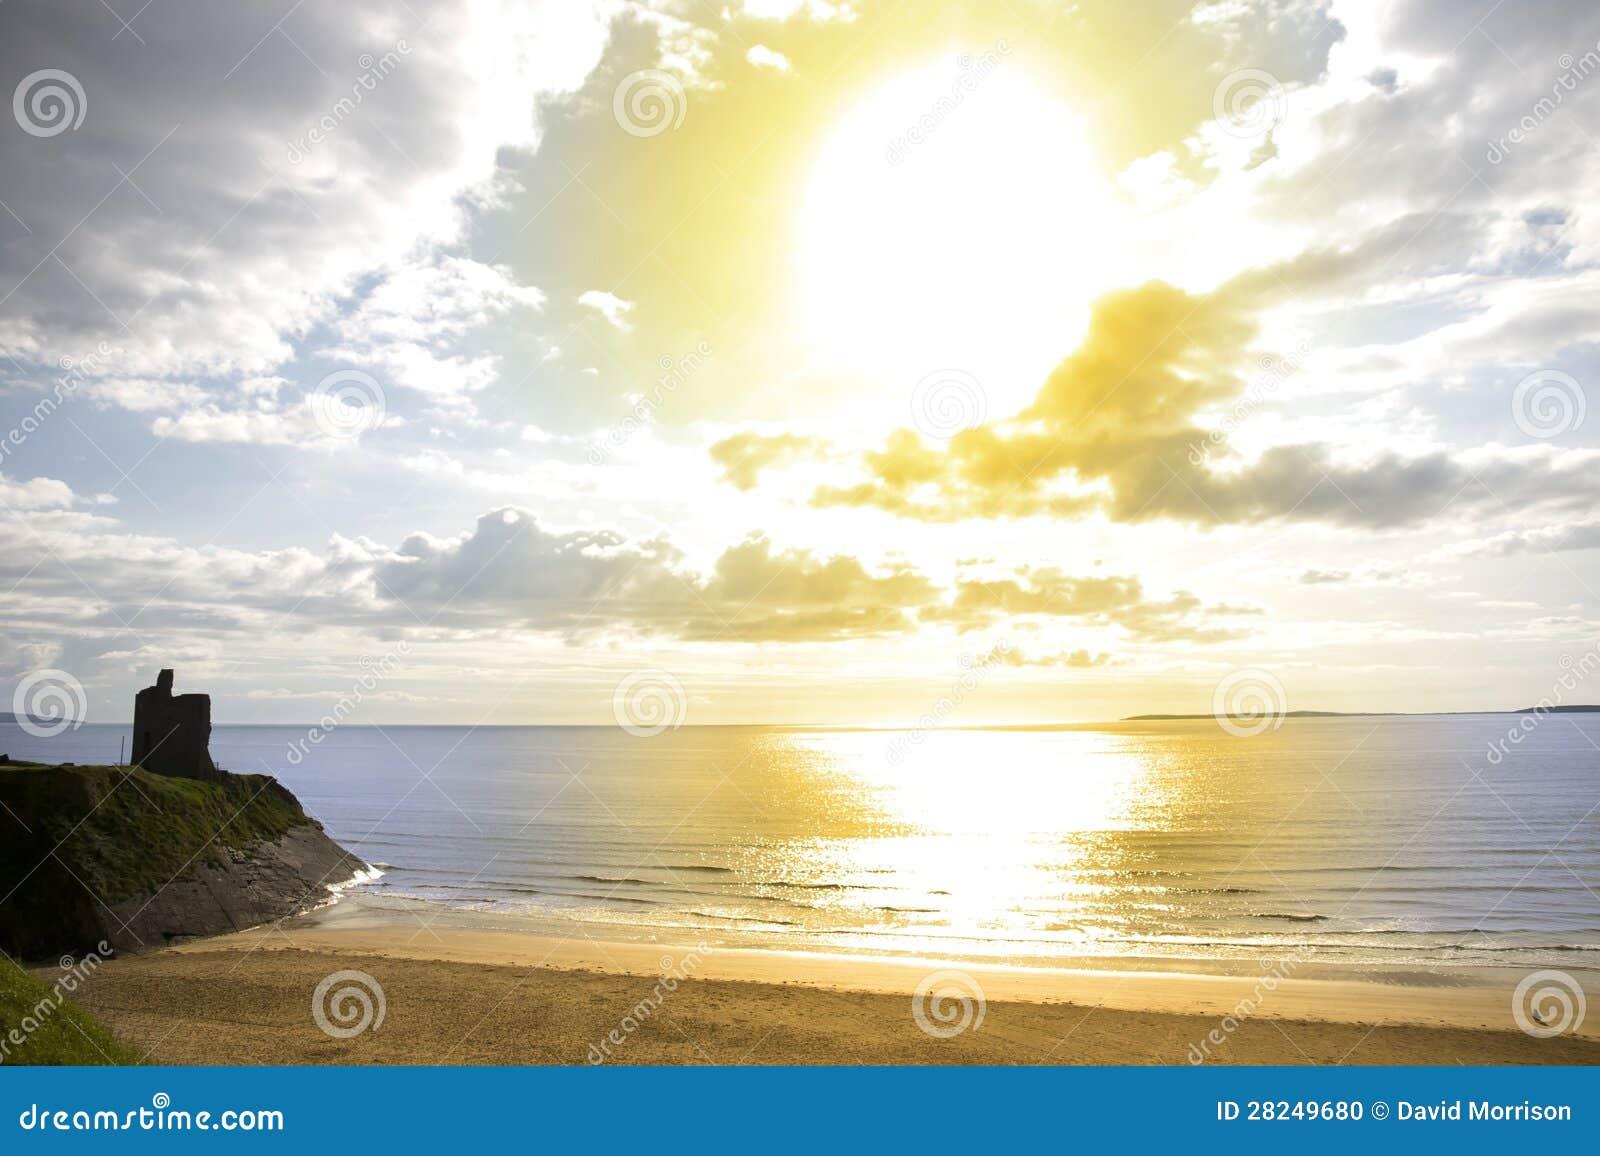 Yellow sun over the Ballybunion beach and castle